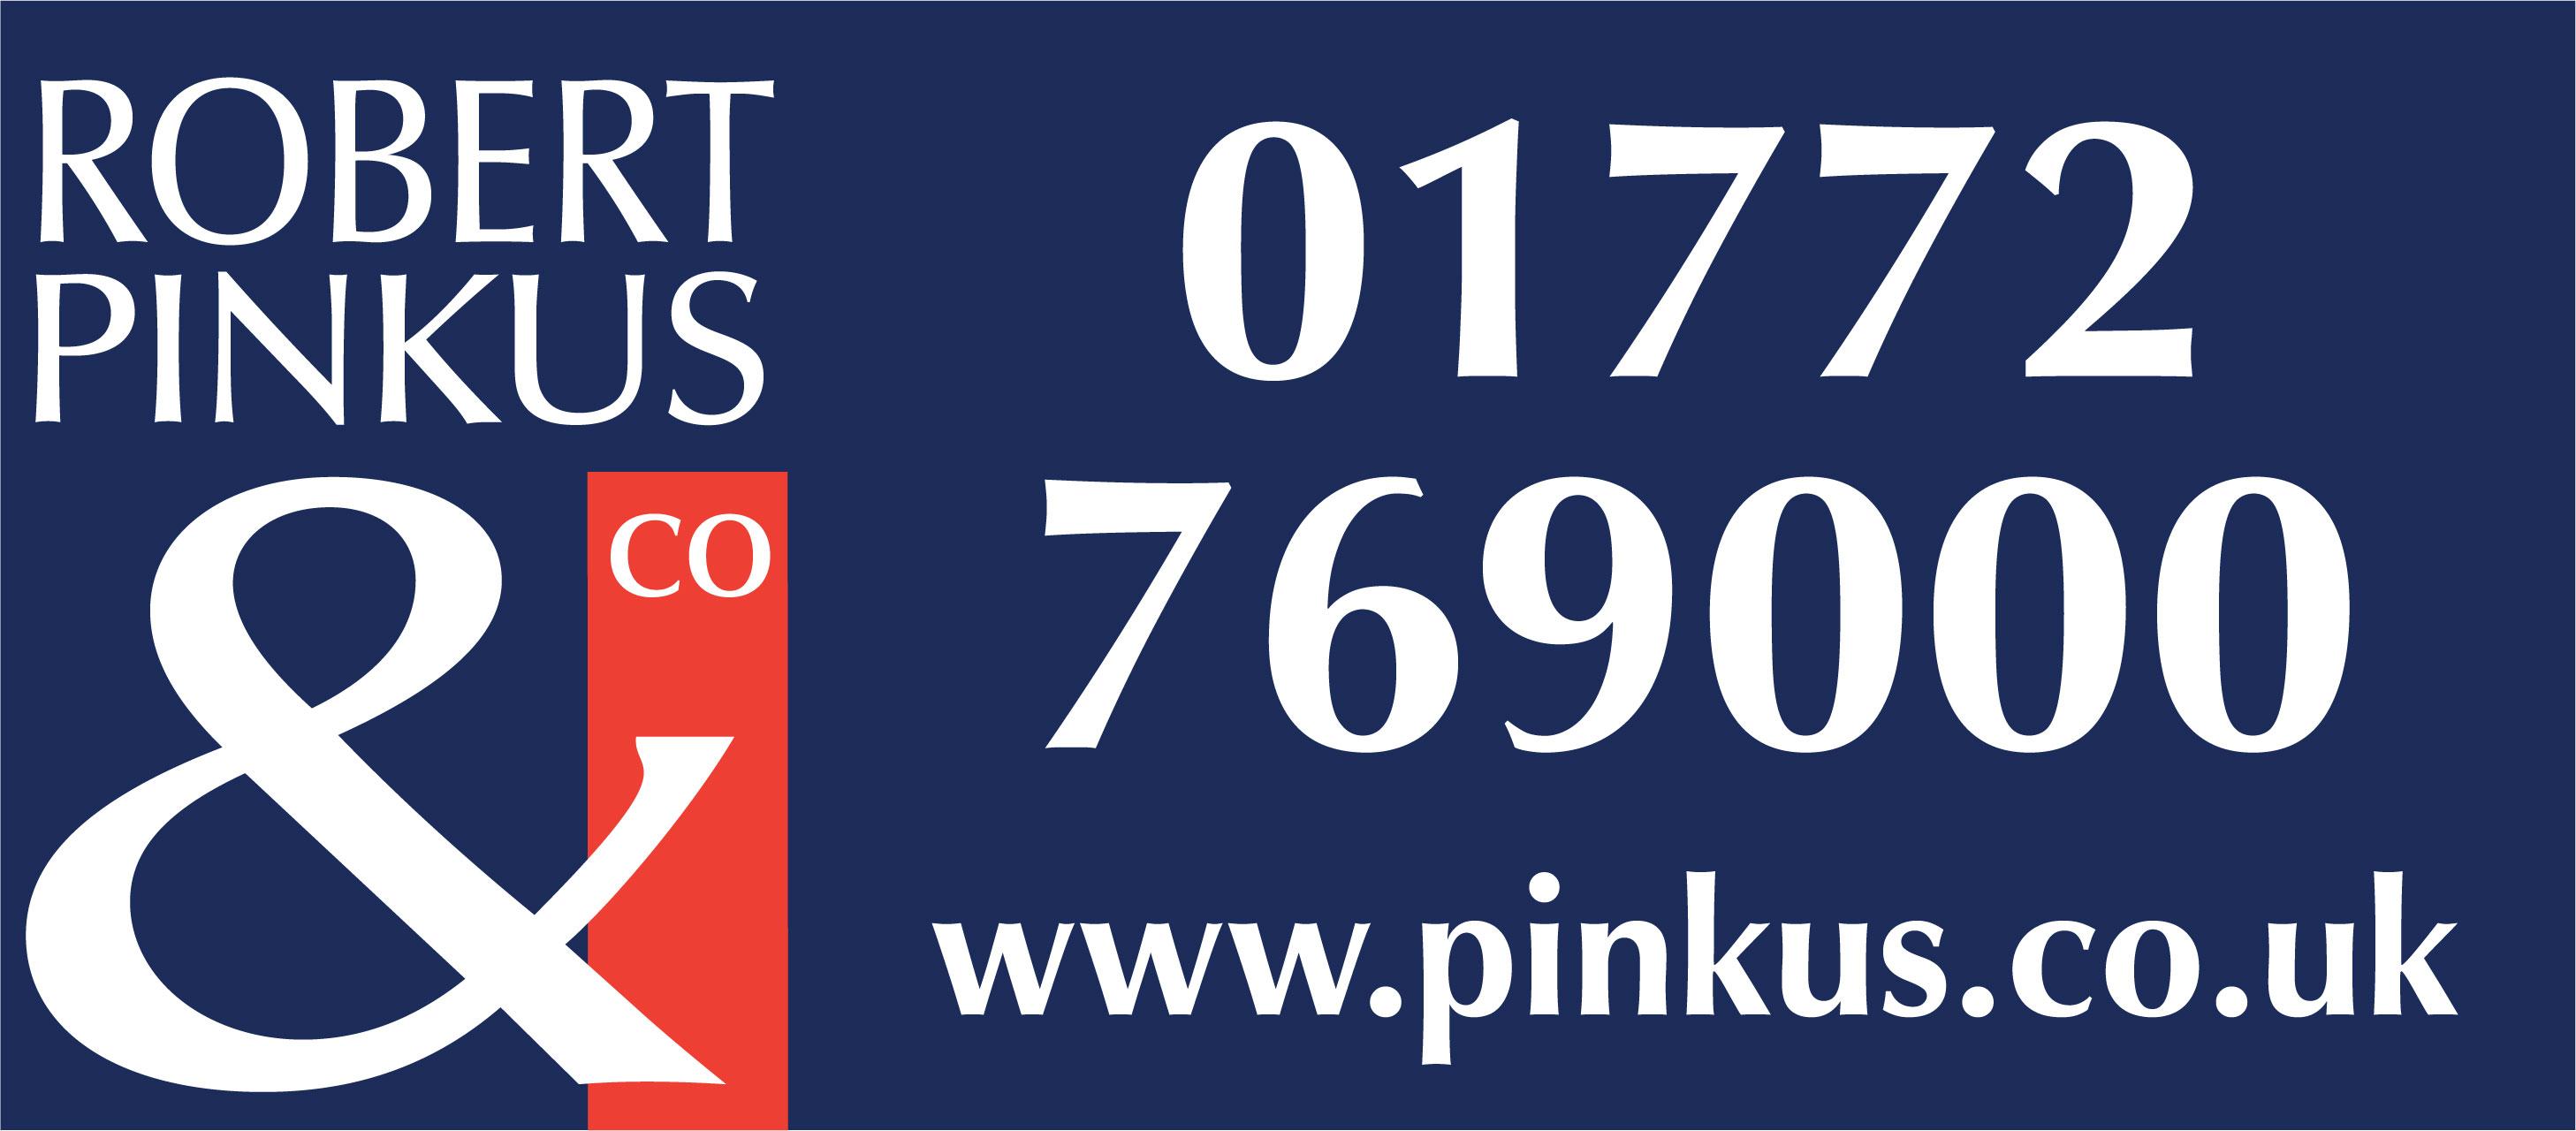 Agent contact - Danny Pinkus